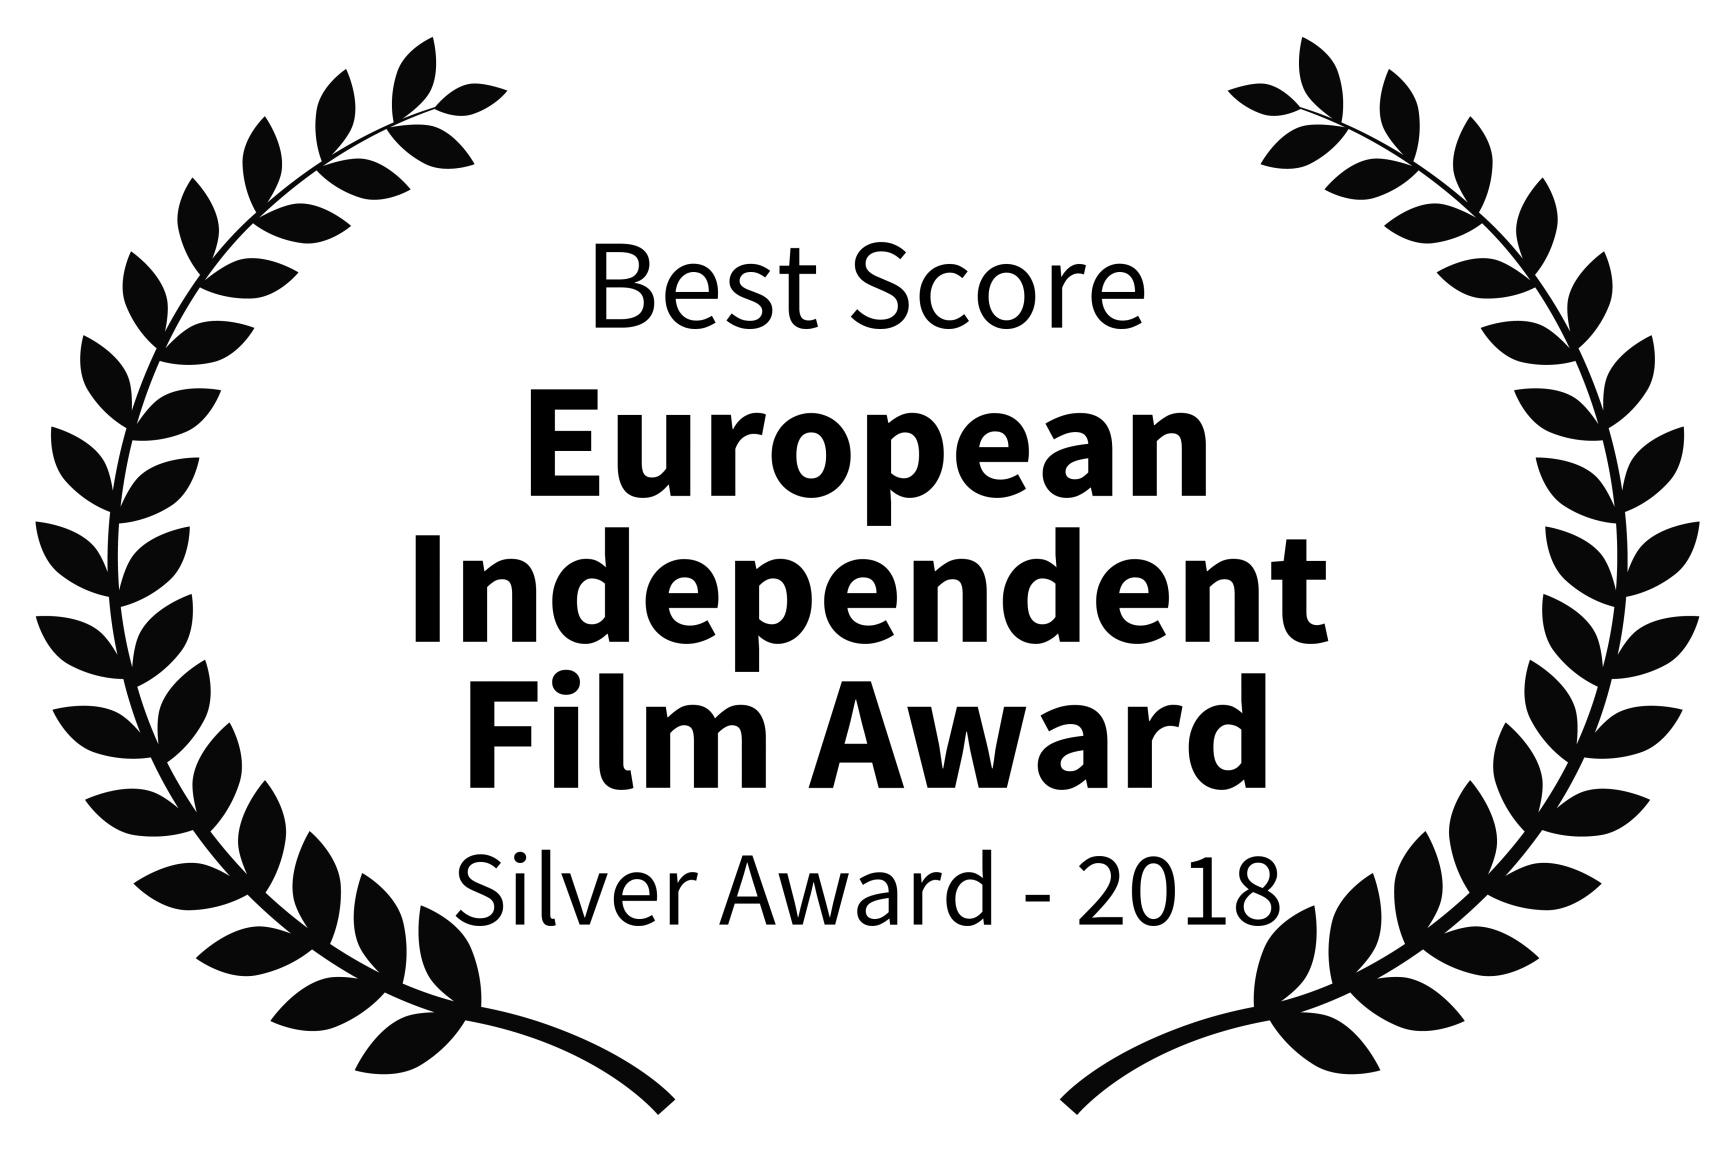 Best Score - European Independent Film Award - Silver Award - 2018.jpg